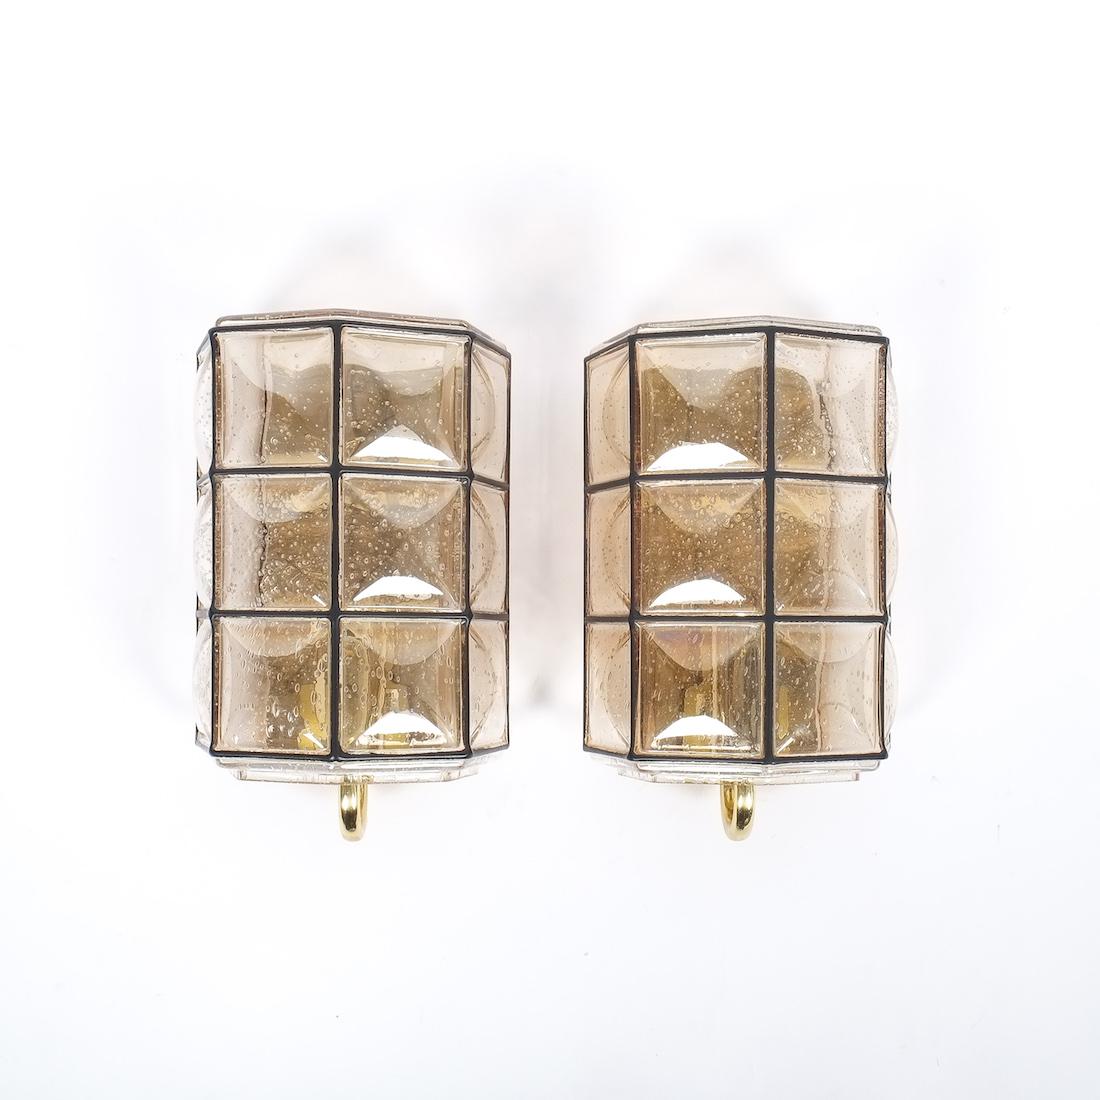 limburg iron gold sconces 1 Kopie  sc 1 st  DERIVE - Vienna & Limburg Pair of Brass and Glass Sconces Wall Lamps Germany 1960